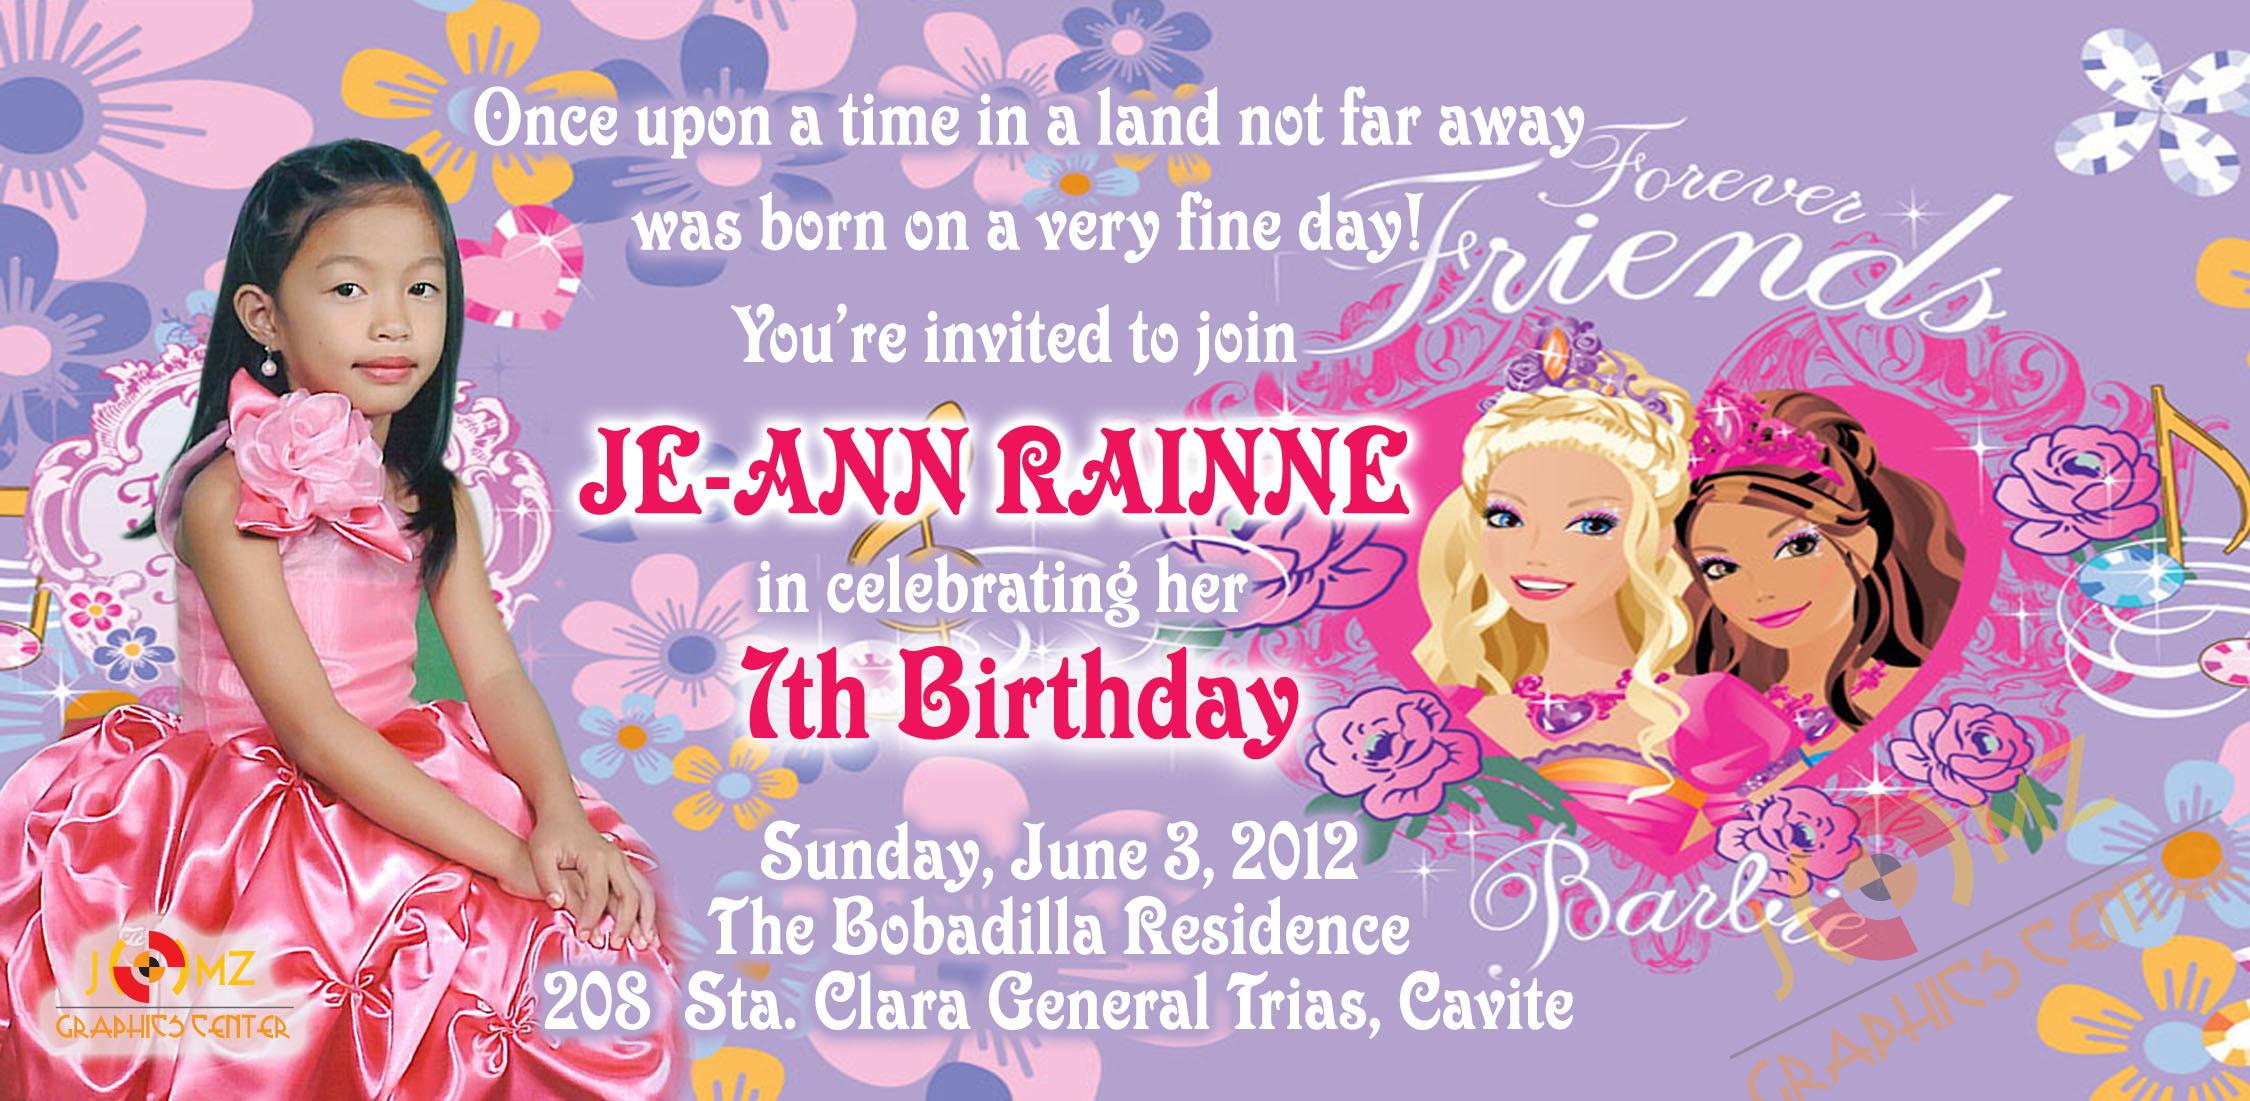 je ann rainne 7th birthday invitation